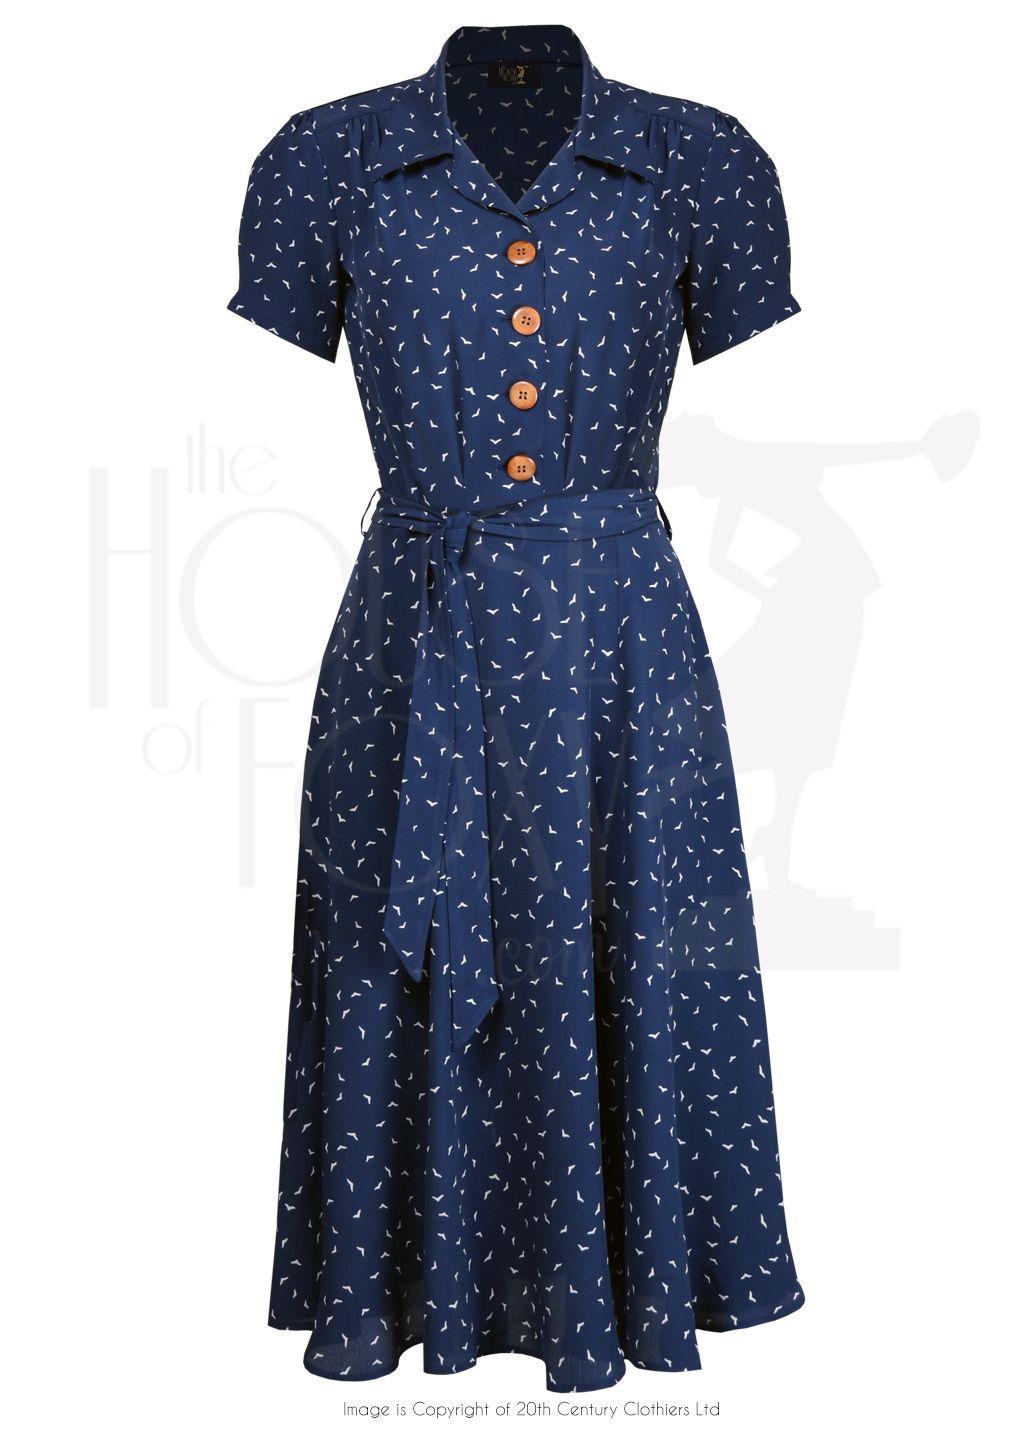 1940s Shirt Waister Dress in Navy Starling Bird Print | Vintage ...